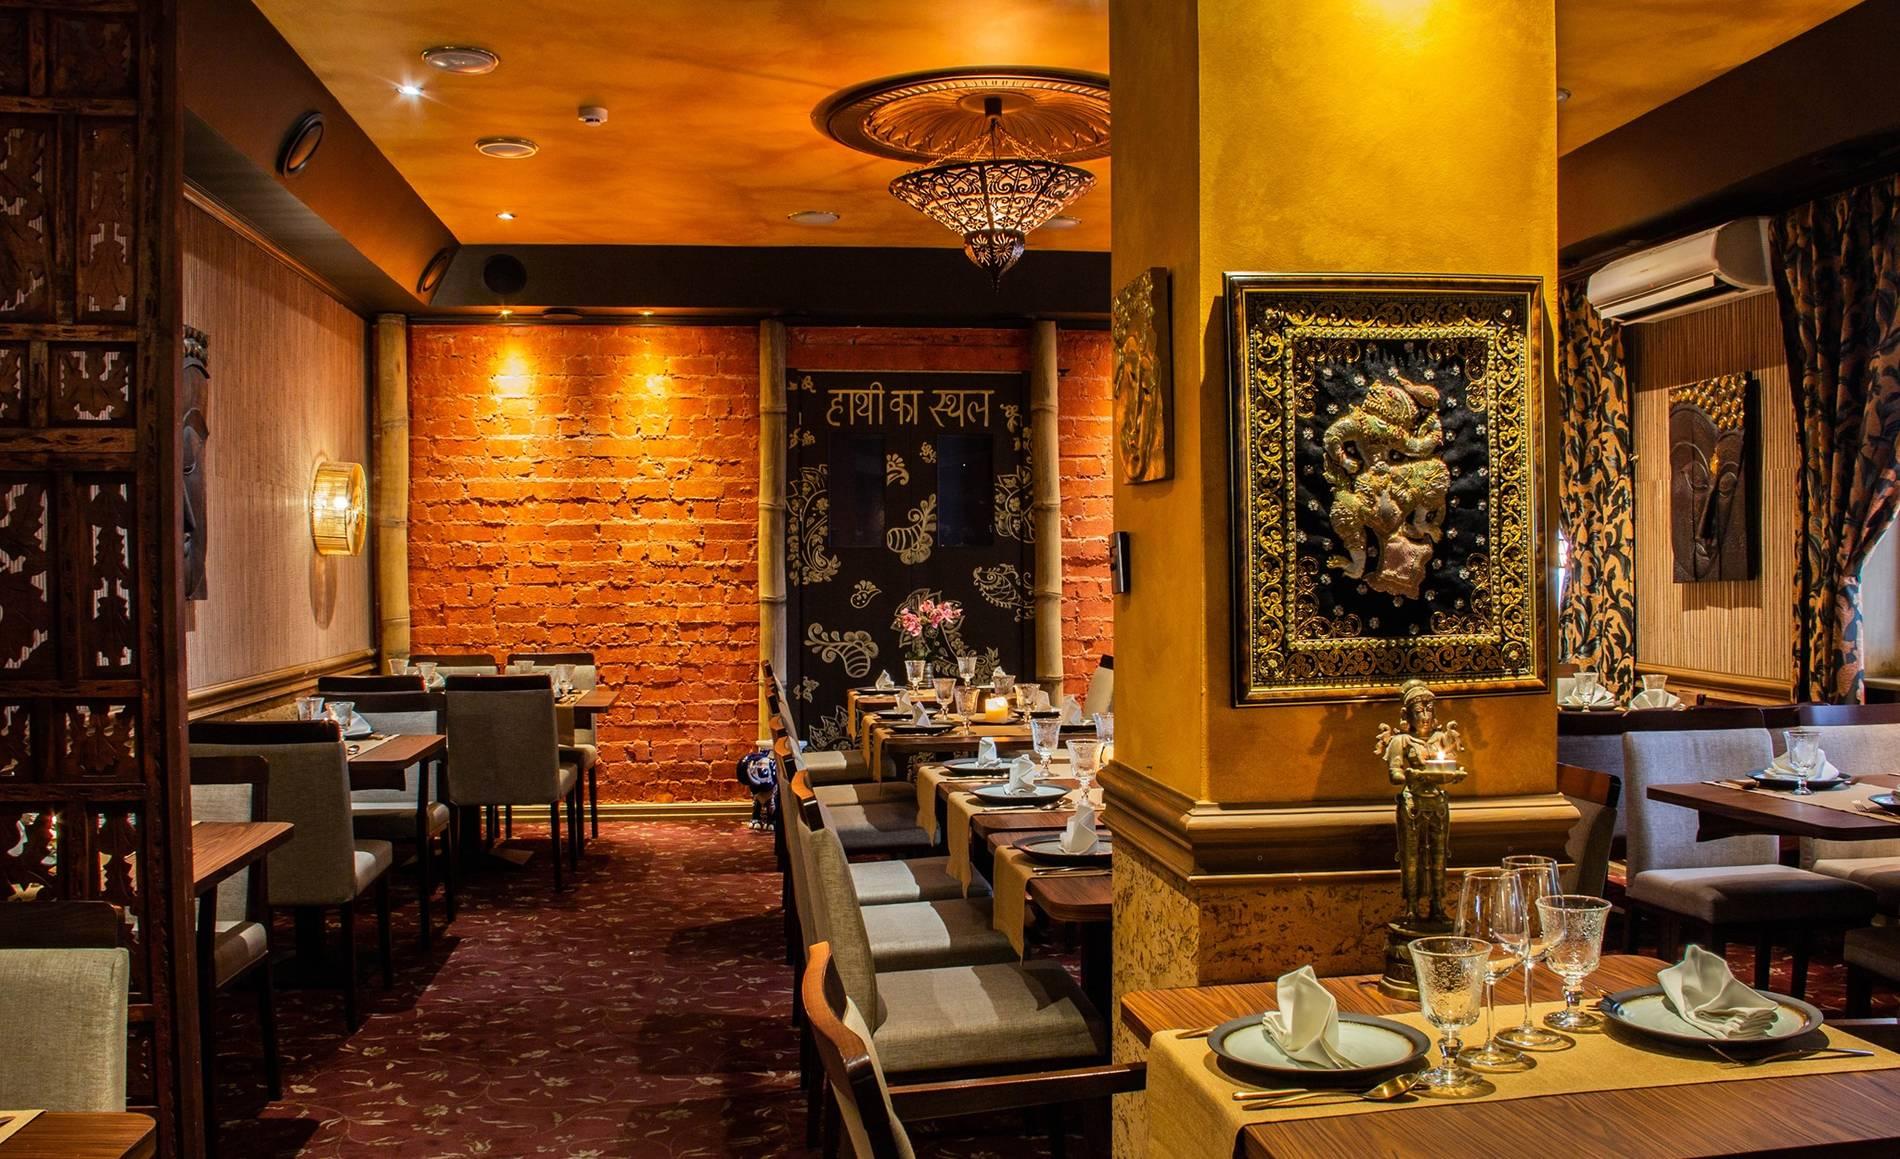 Internal view of the Villa Thai restaurant in Tallinn, Estonia.